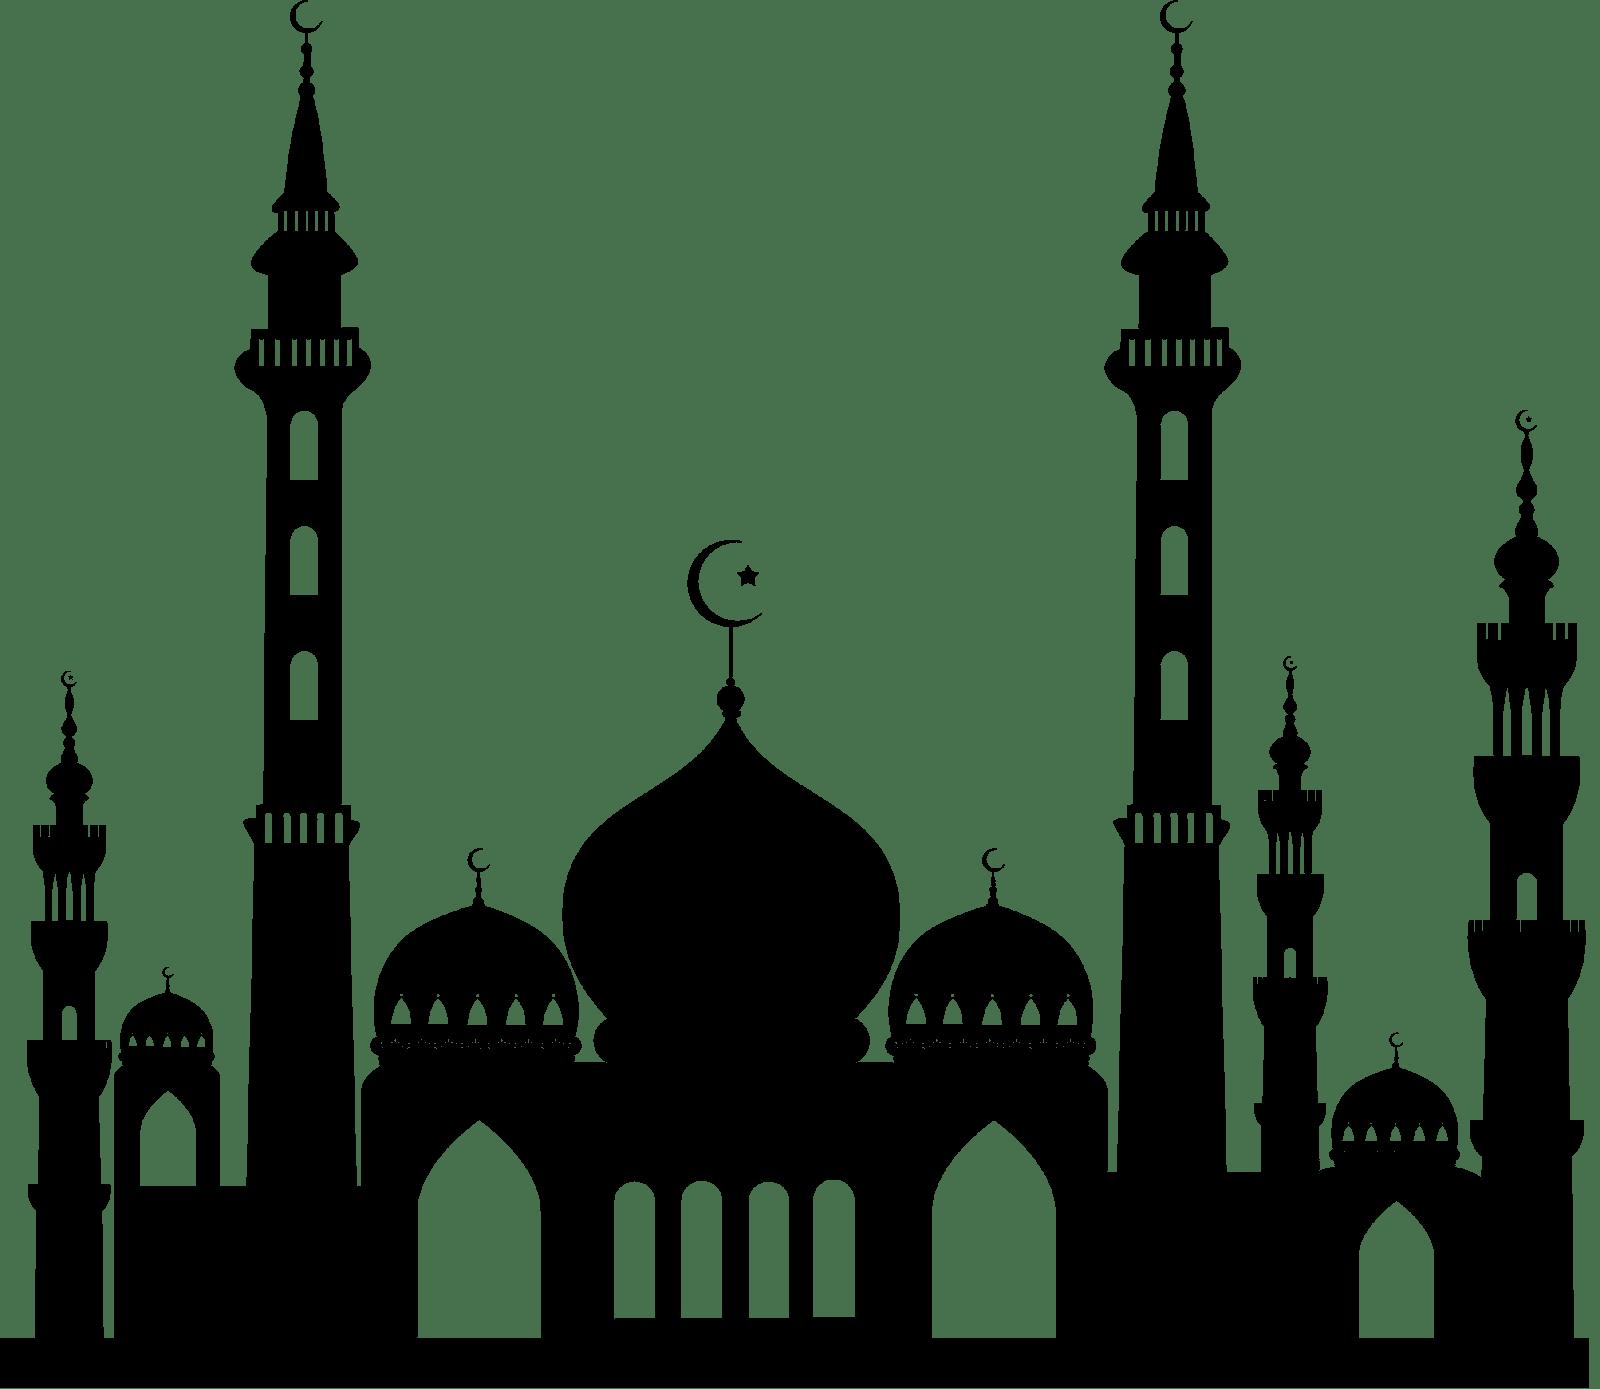 Gambar Vector Masjid Hd